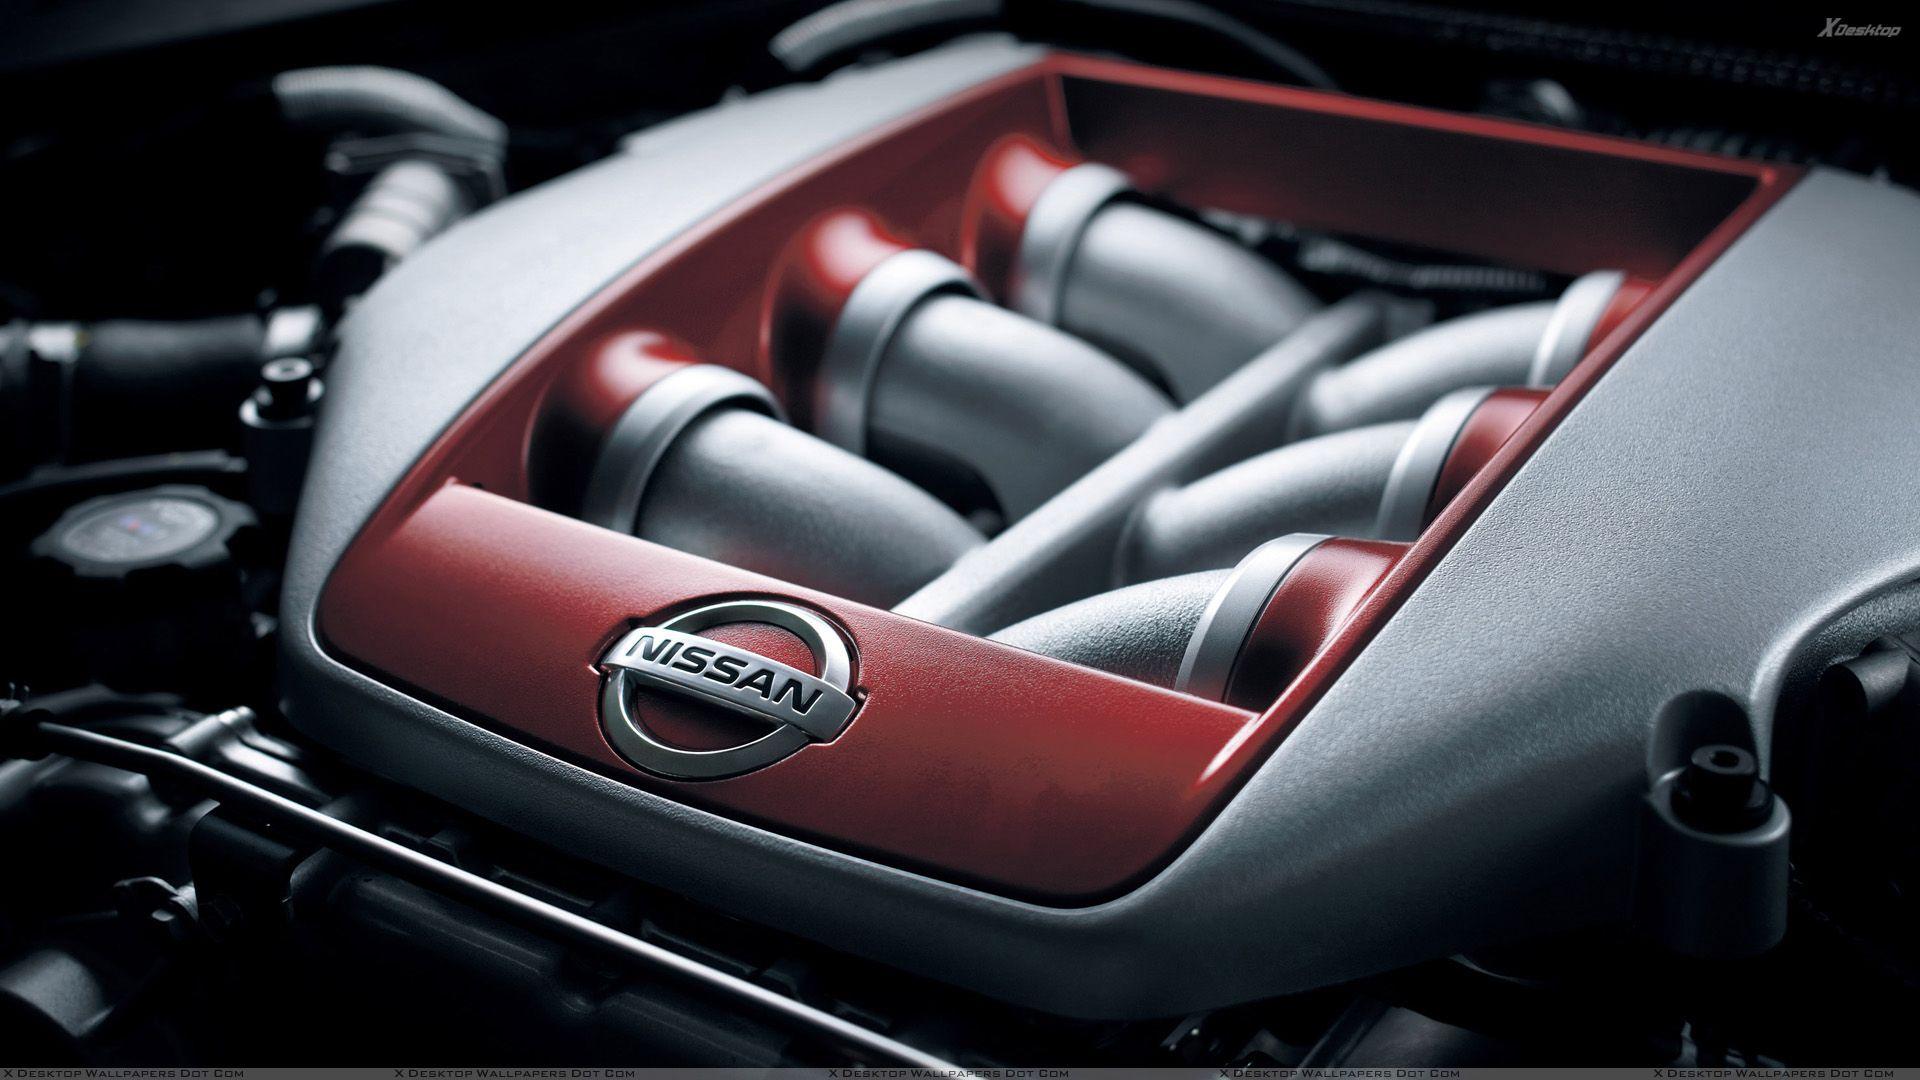 Nissan GTR Engine and Logo Wallpapers · 4K HD Desktop ...